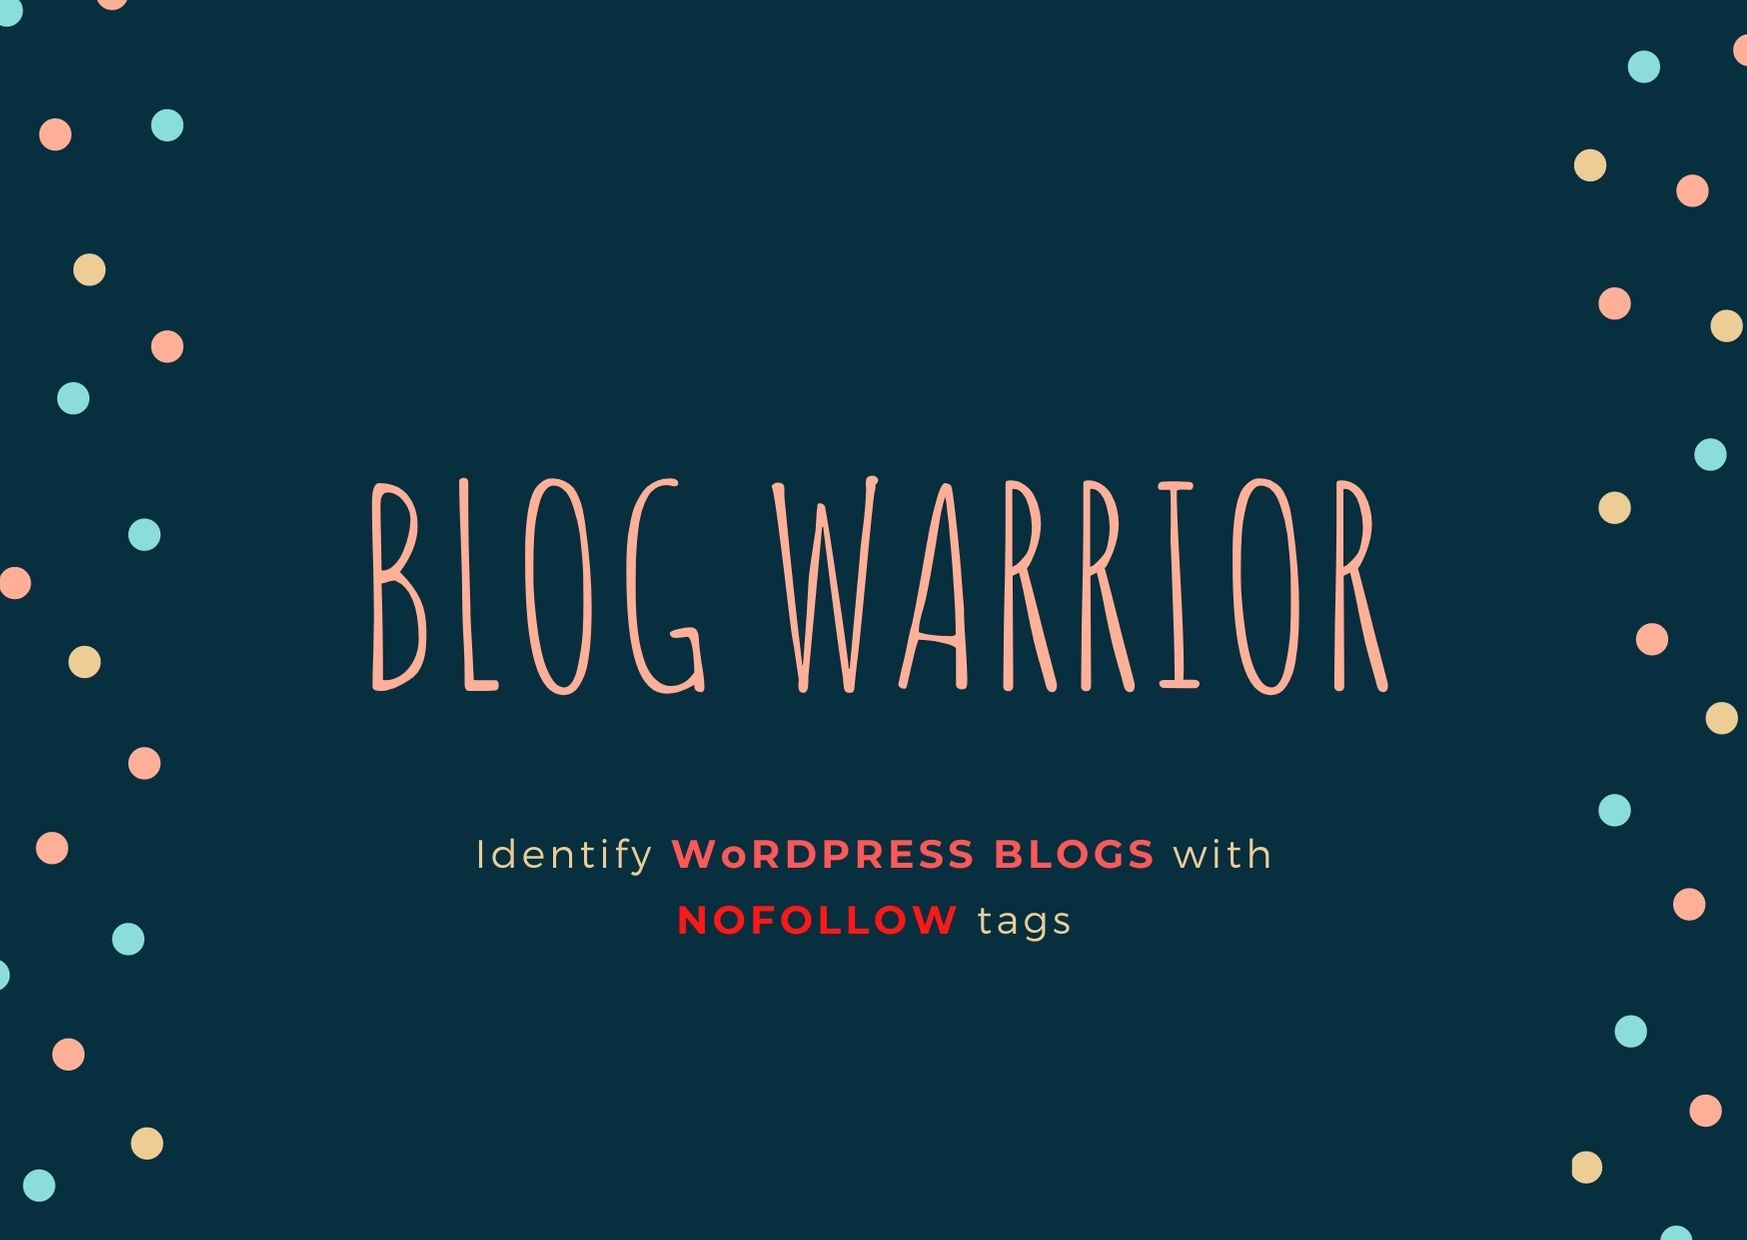 BLOG WARRIOR - Identify WORDPRESS BLOGS with NOFOLLOW tag